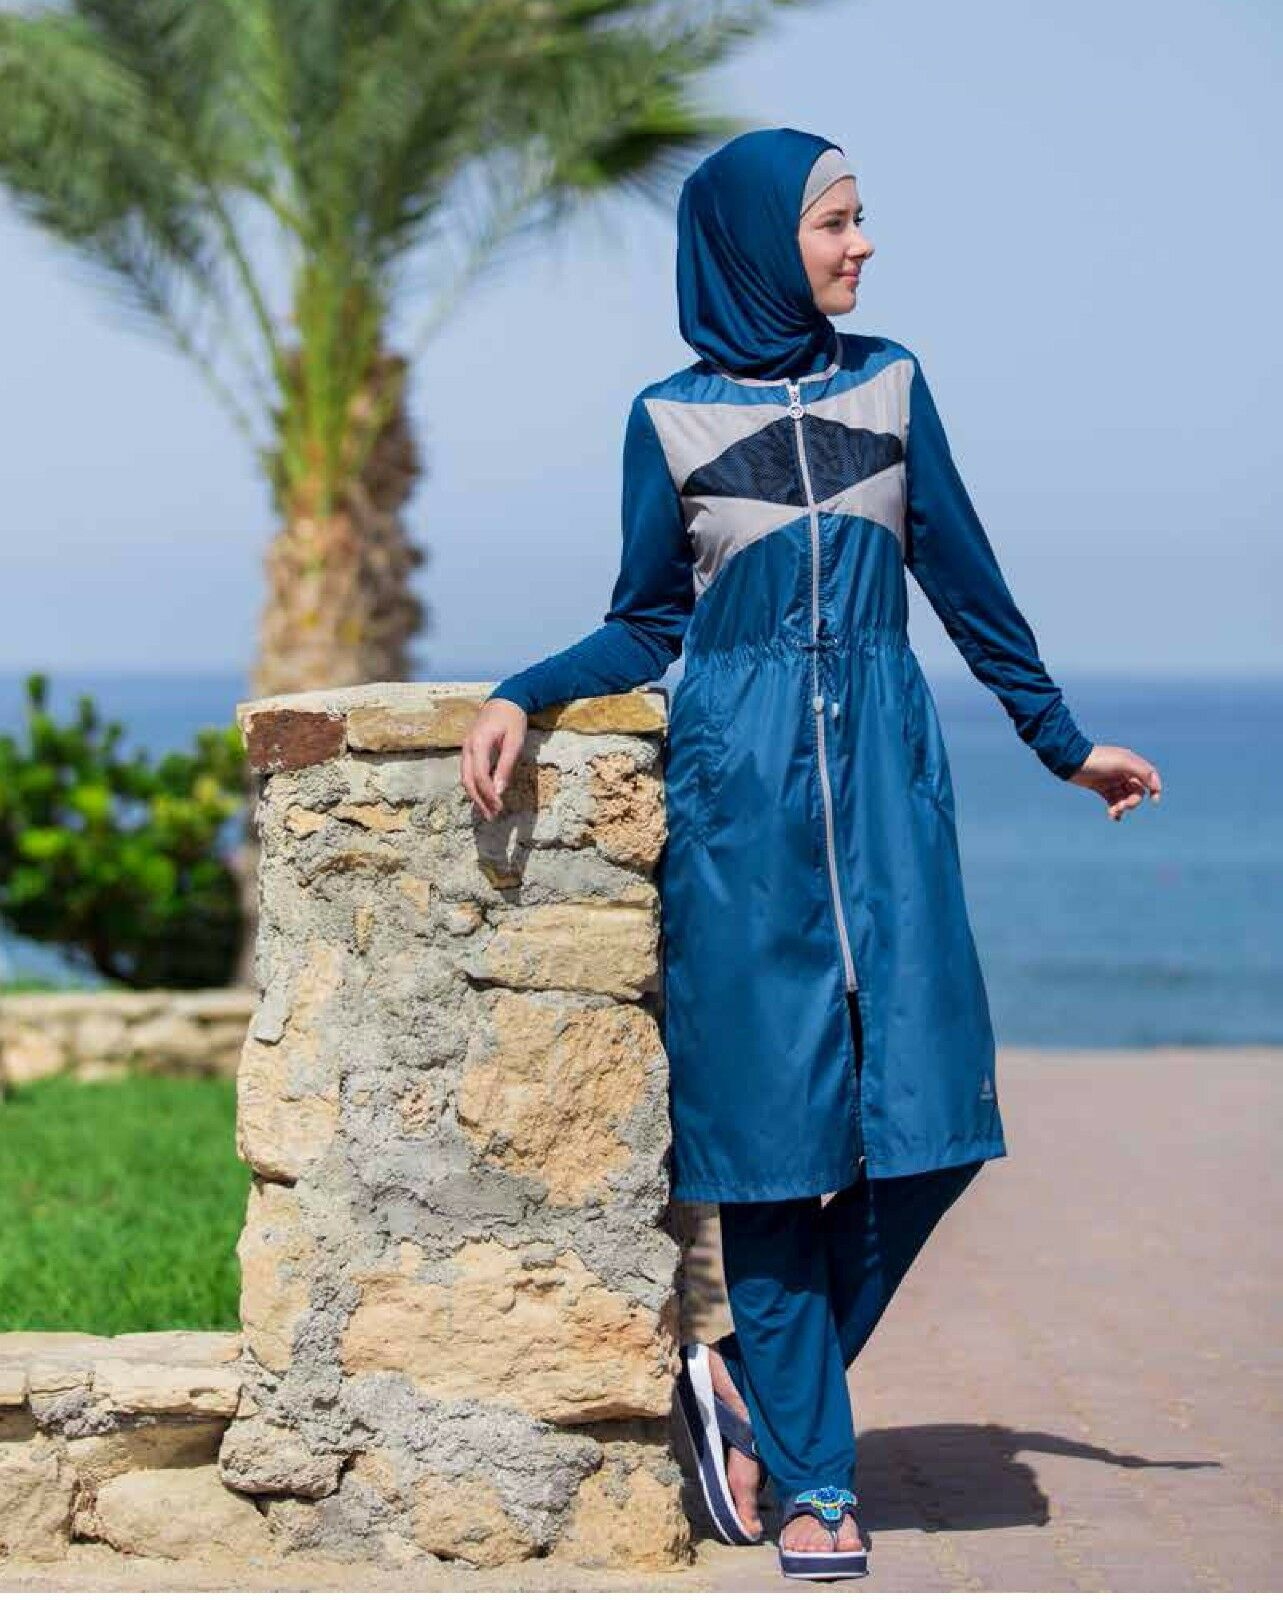 Adabkini NEVRA, Womens modest swimsuit, burqini, Full covered with head cover